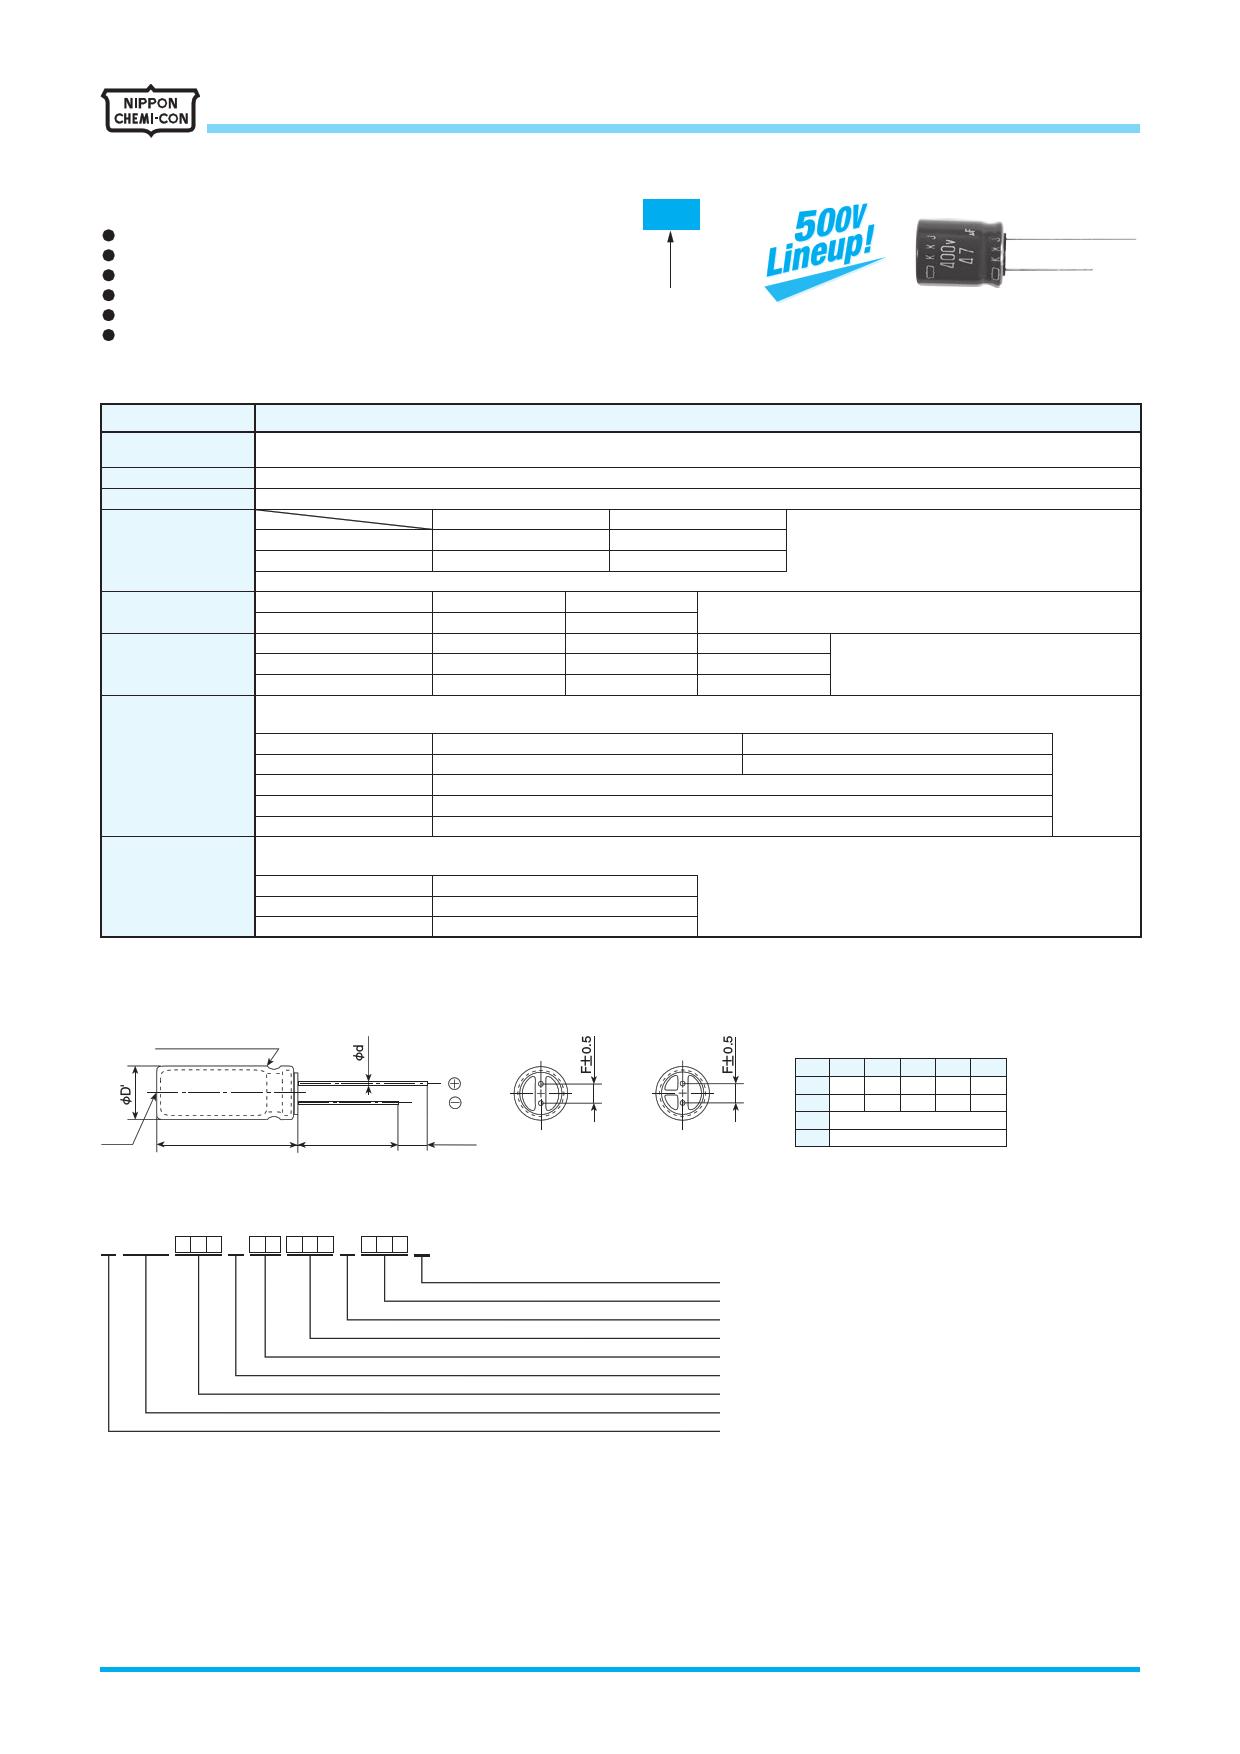 EKXJ421E Datasheet, EKXJ421E PDF,ピン配置, 機能